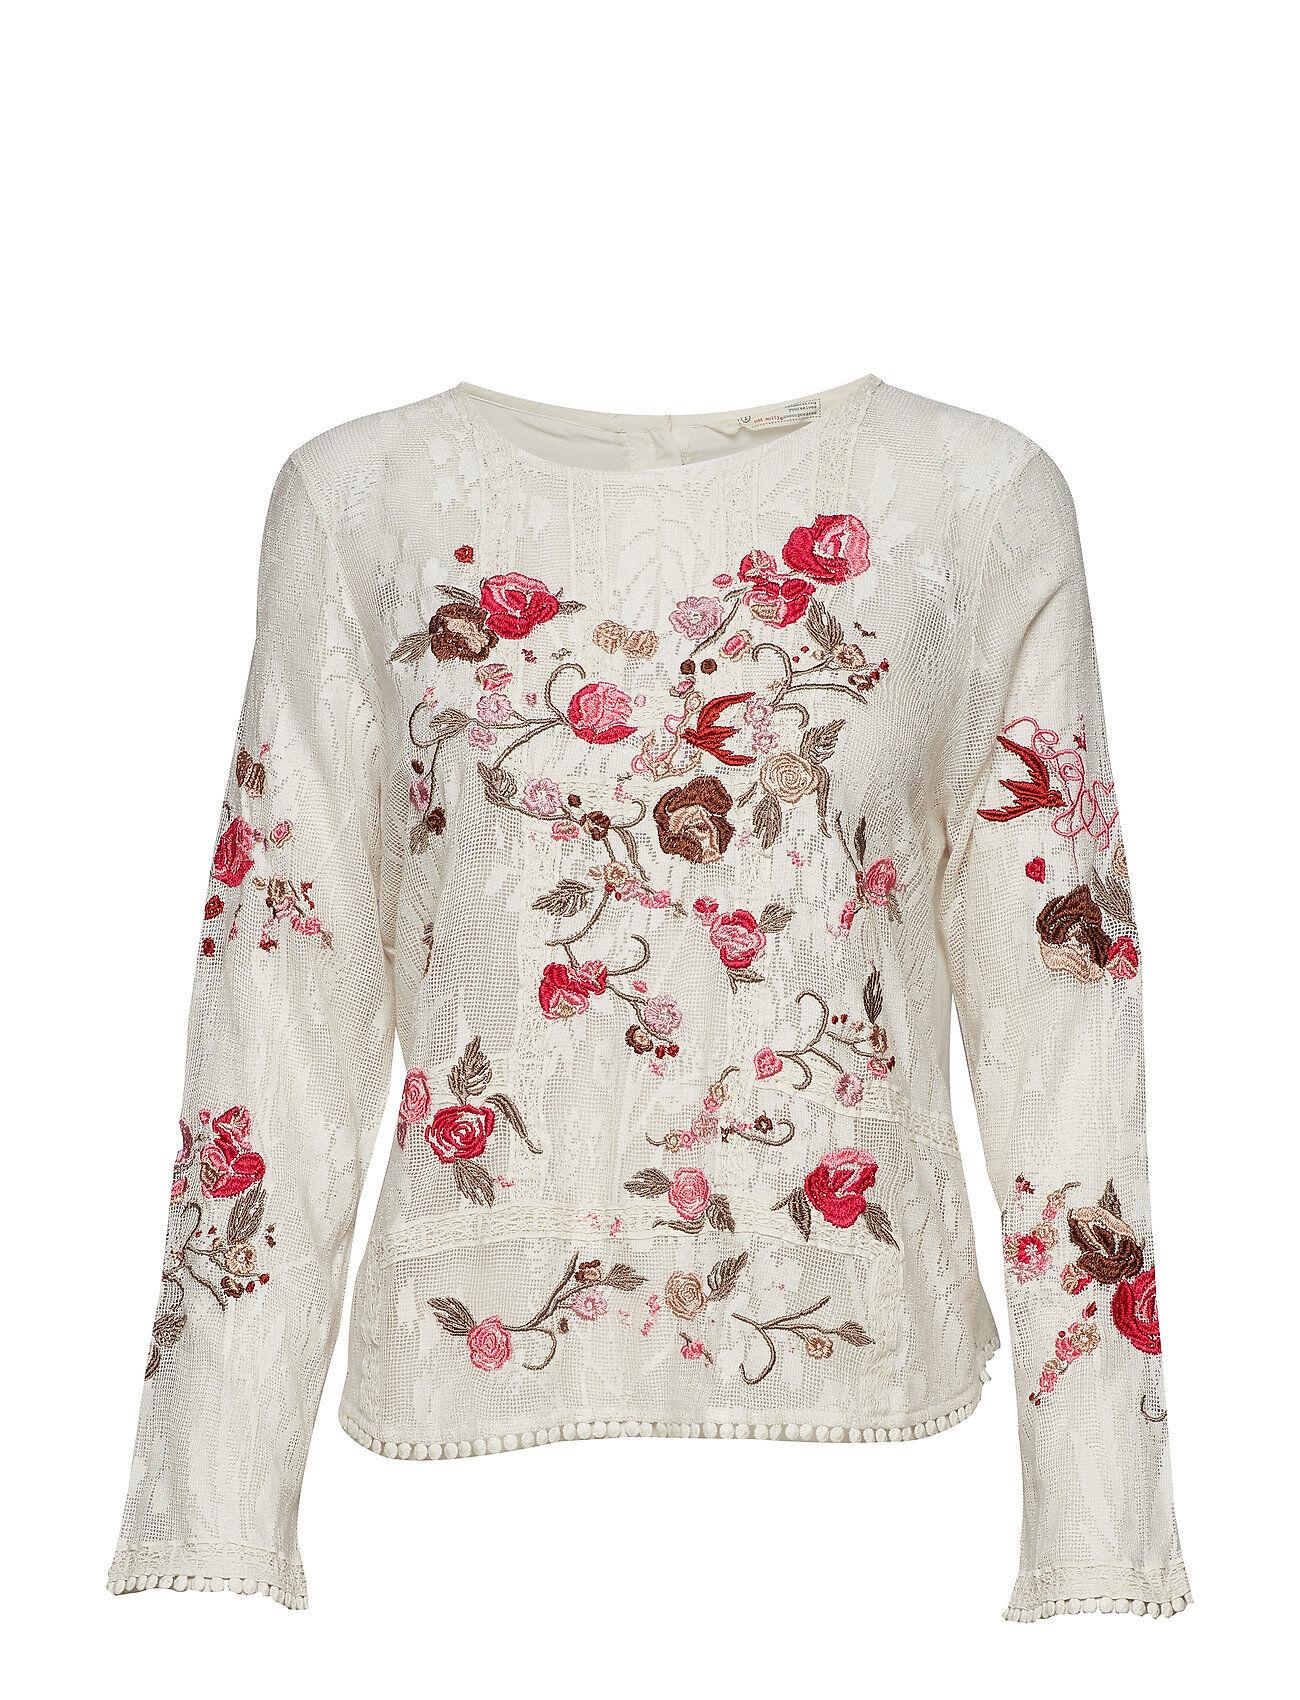 Image of ODD MOLLY Misty Magic Top T-shirts & Tops Long-sleeved Valkoinen ODD MOLLY